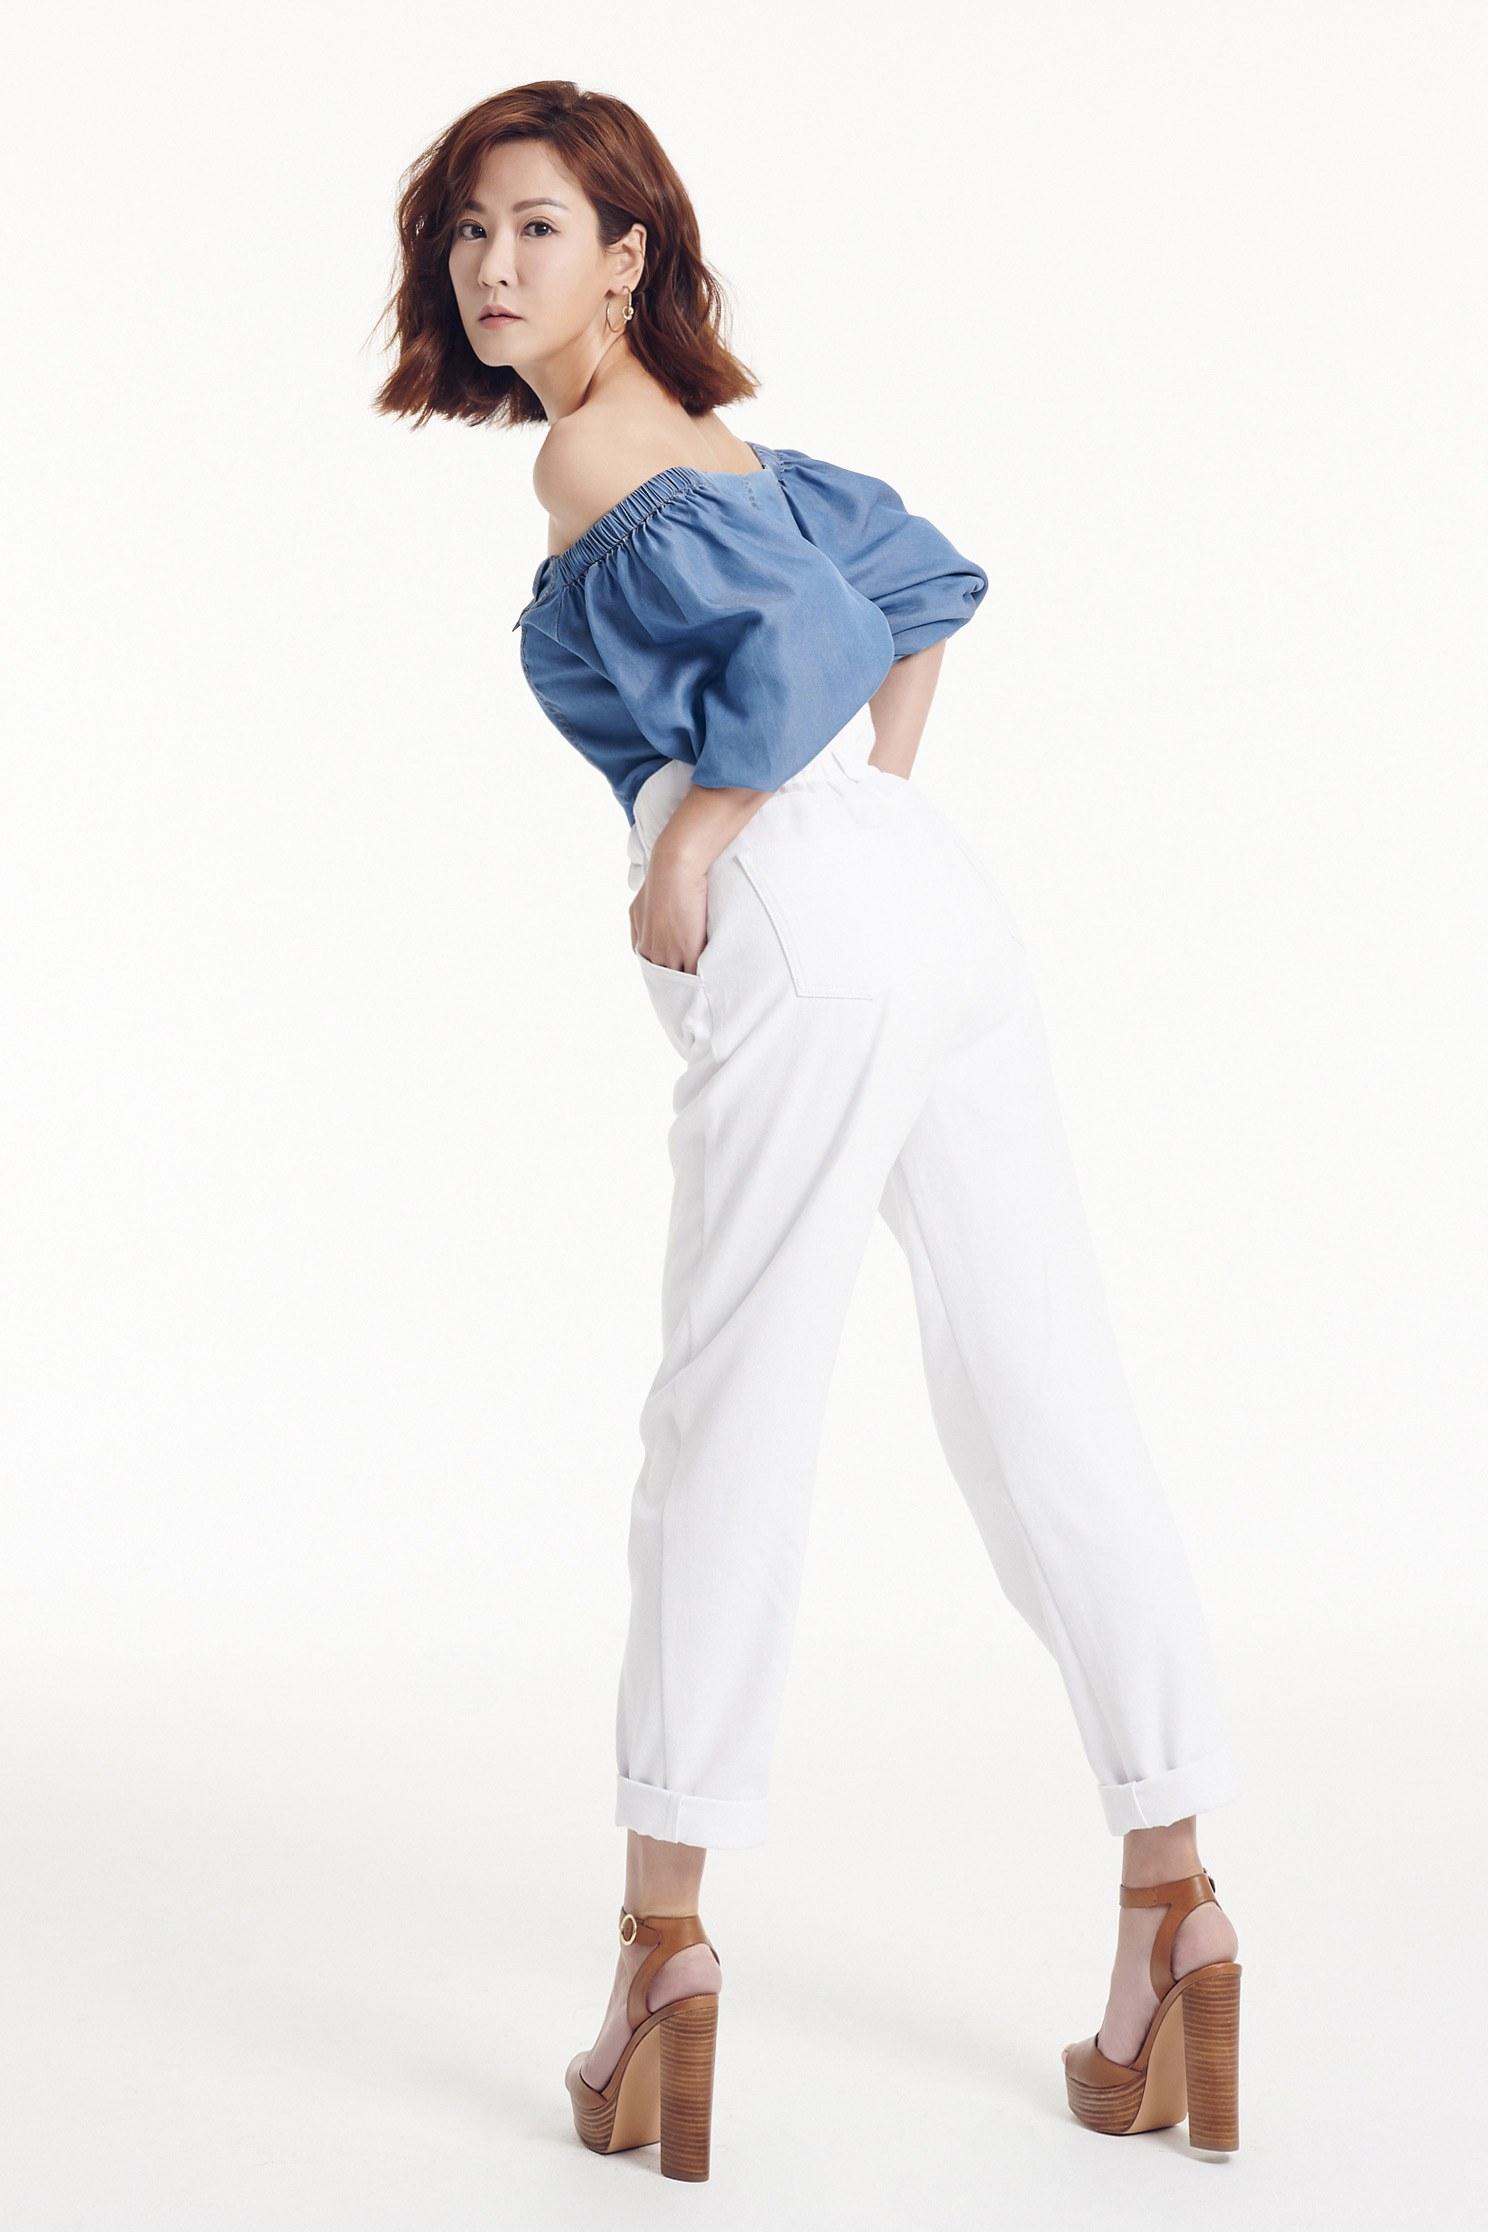 tube ruffle  sleeves Vintage Pants set,top,onlinelimitededition,jeans